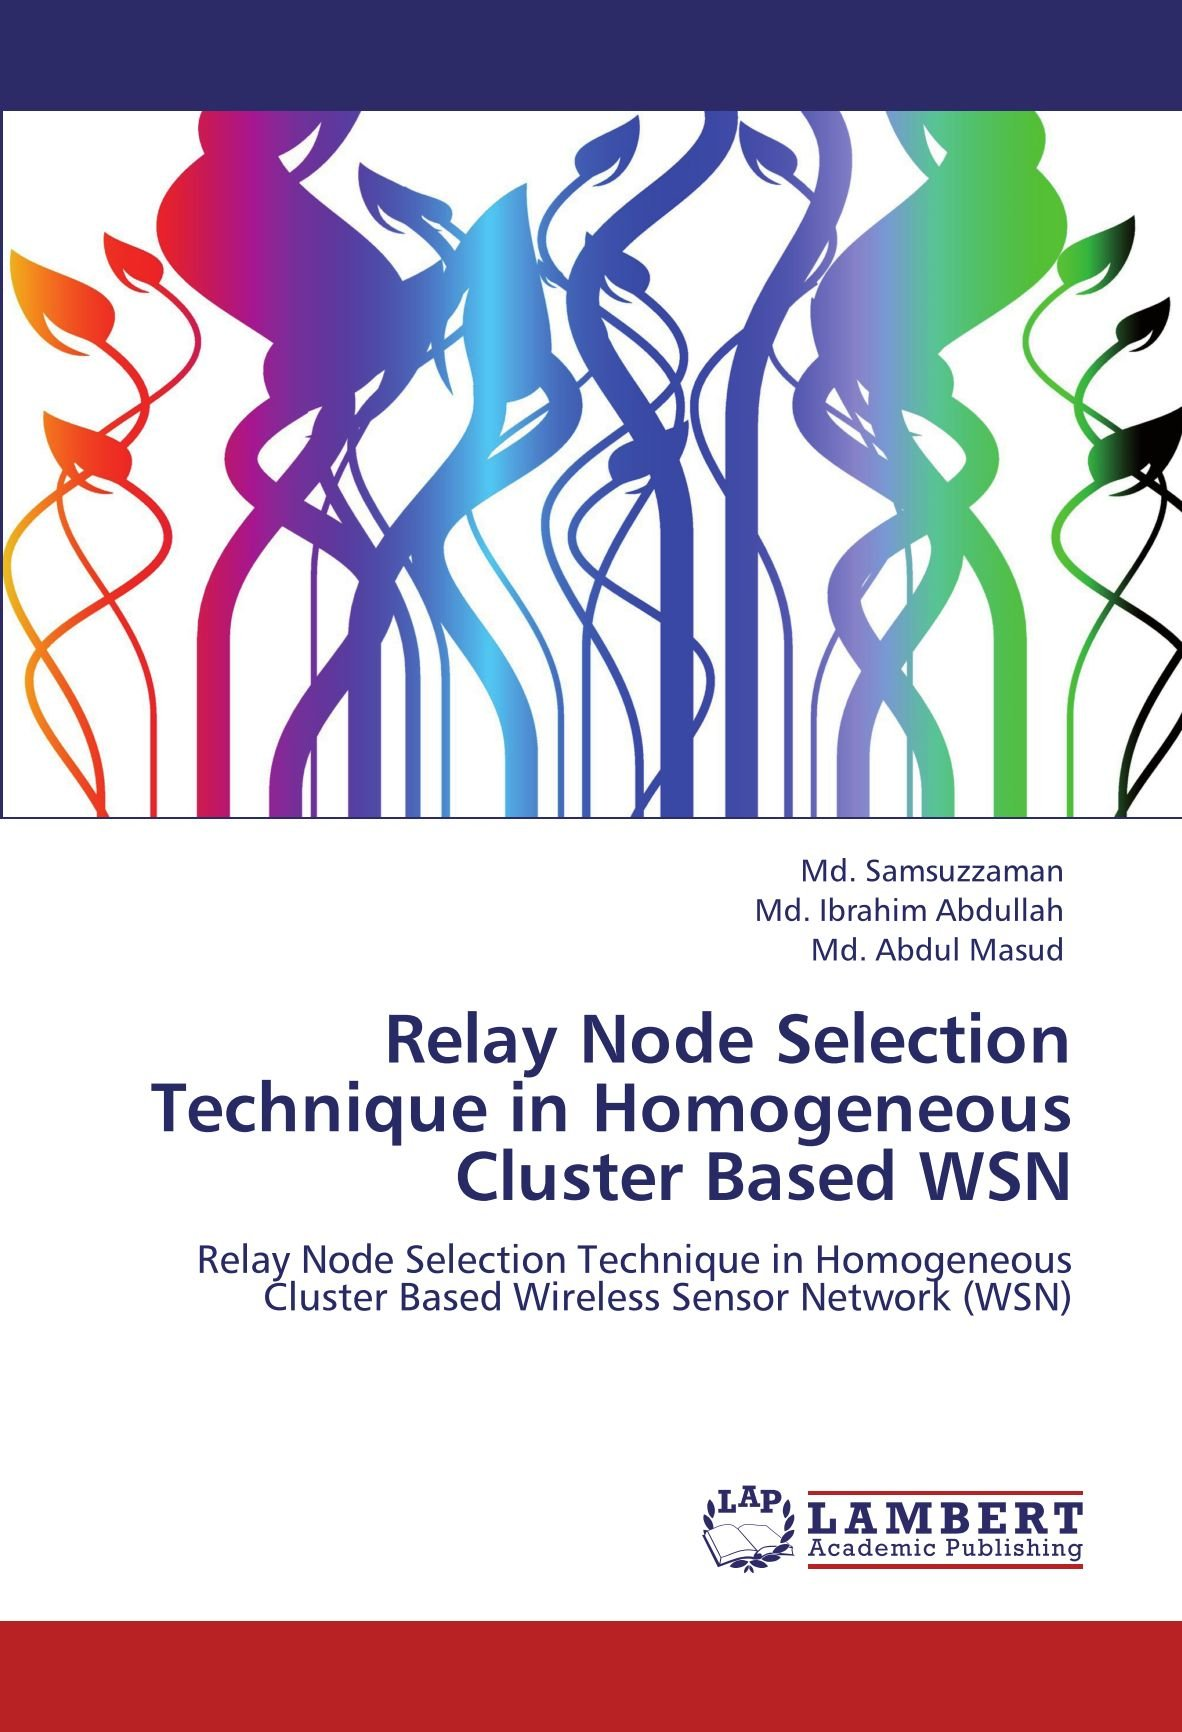 Read Online Relay Node Selection Technique in Homogeneous Cluster Based WSN: Relay Node Selection Technique in Homogeneous Cluster Based   Wireless Sensor Network (WSN) pdf